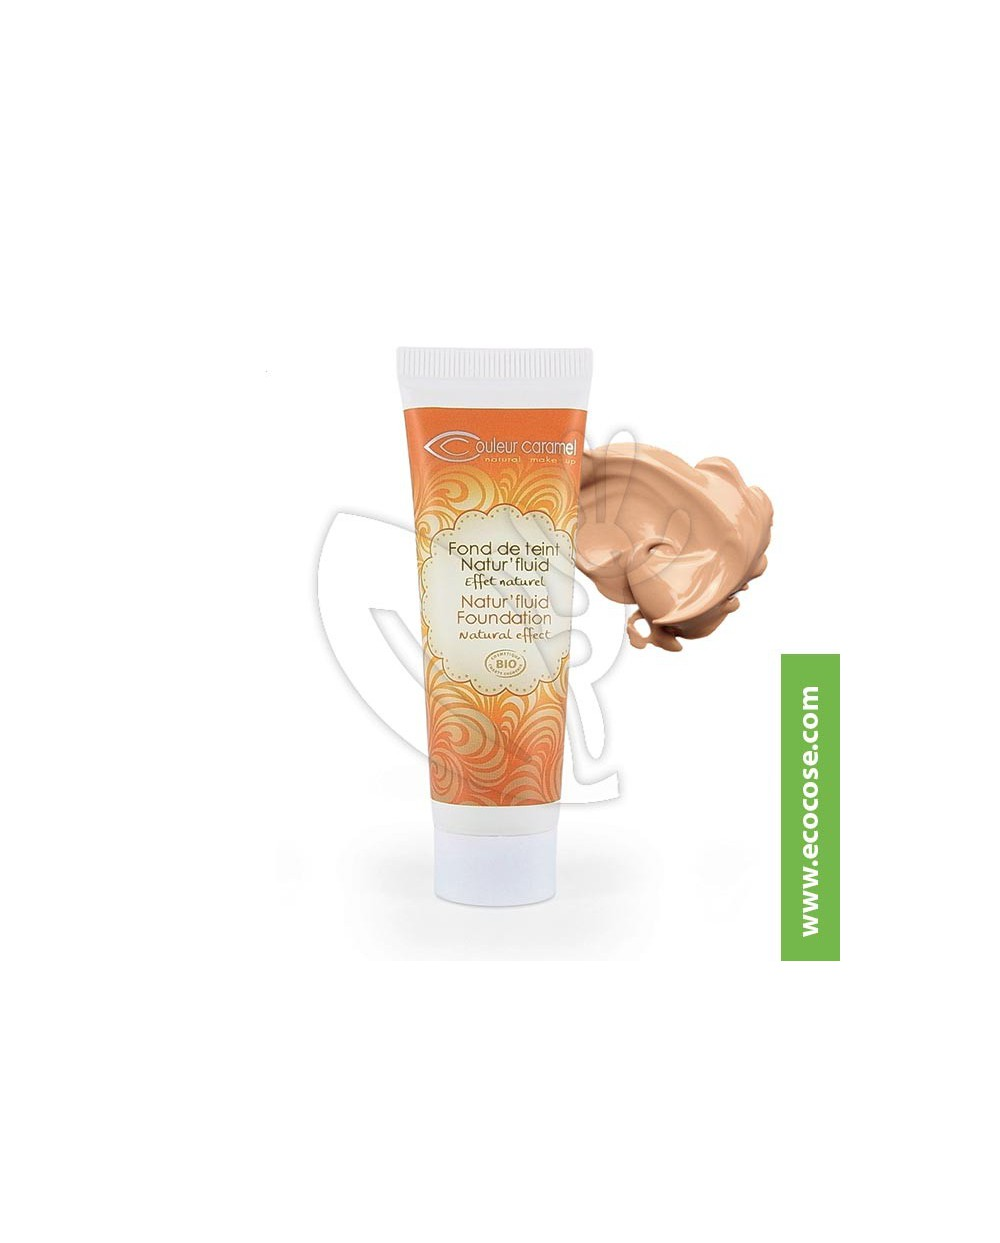 Couleur Caramel - Fondotinta Natur' Fluid - Beige Doré 14